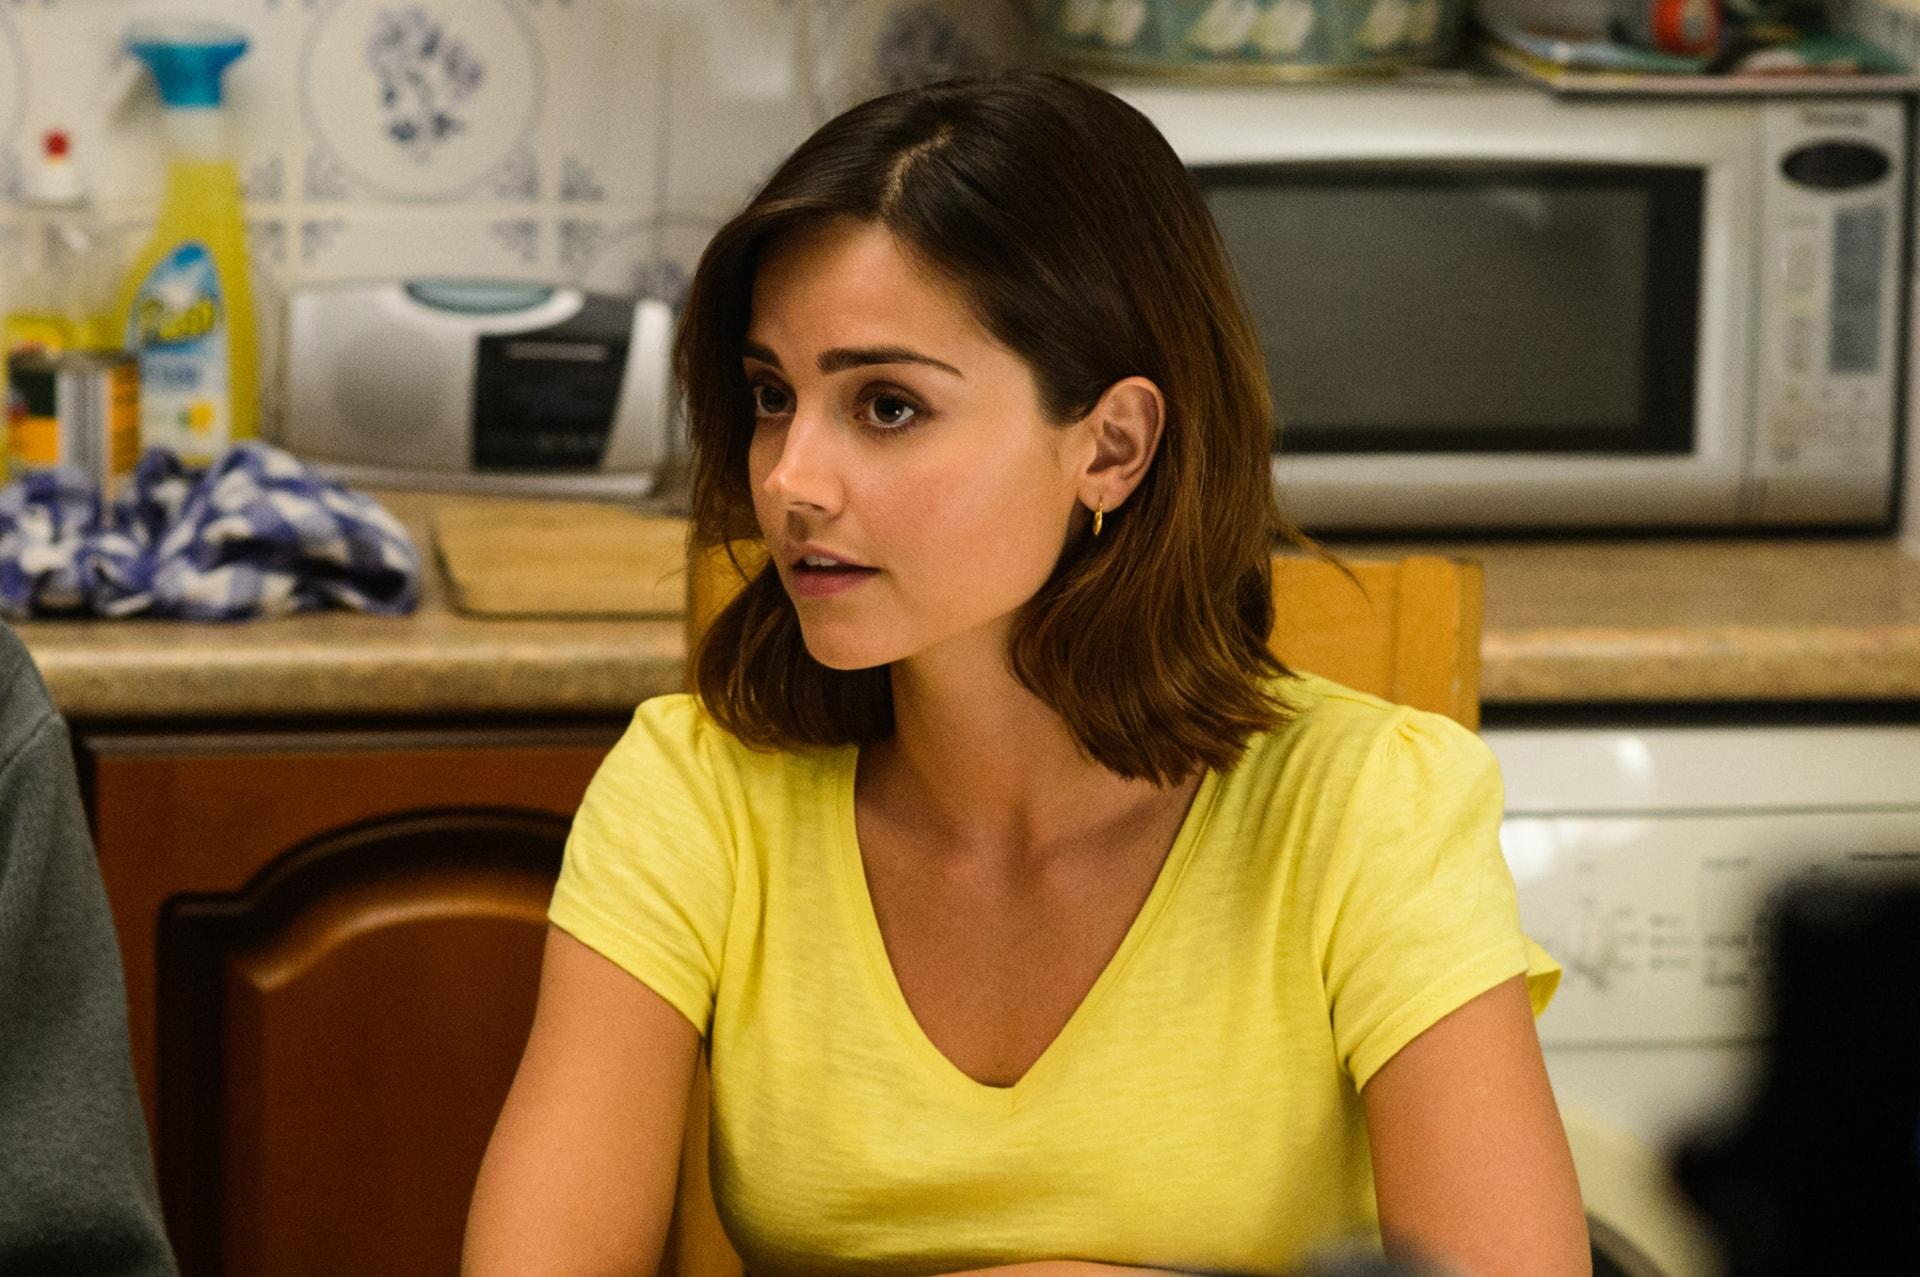 ENNA COLEMAN as Katrina Clark wearing a yellow t-shirt sitting in a kitchen.